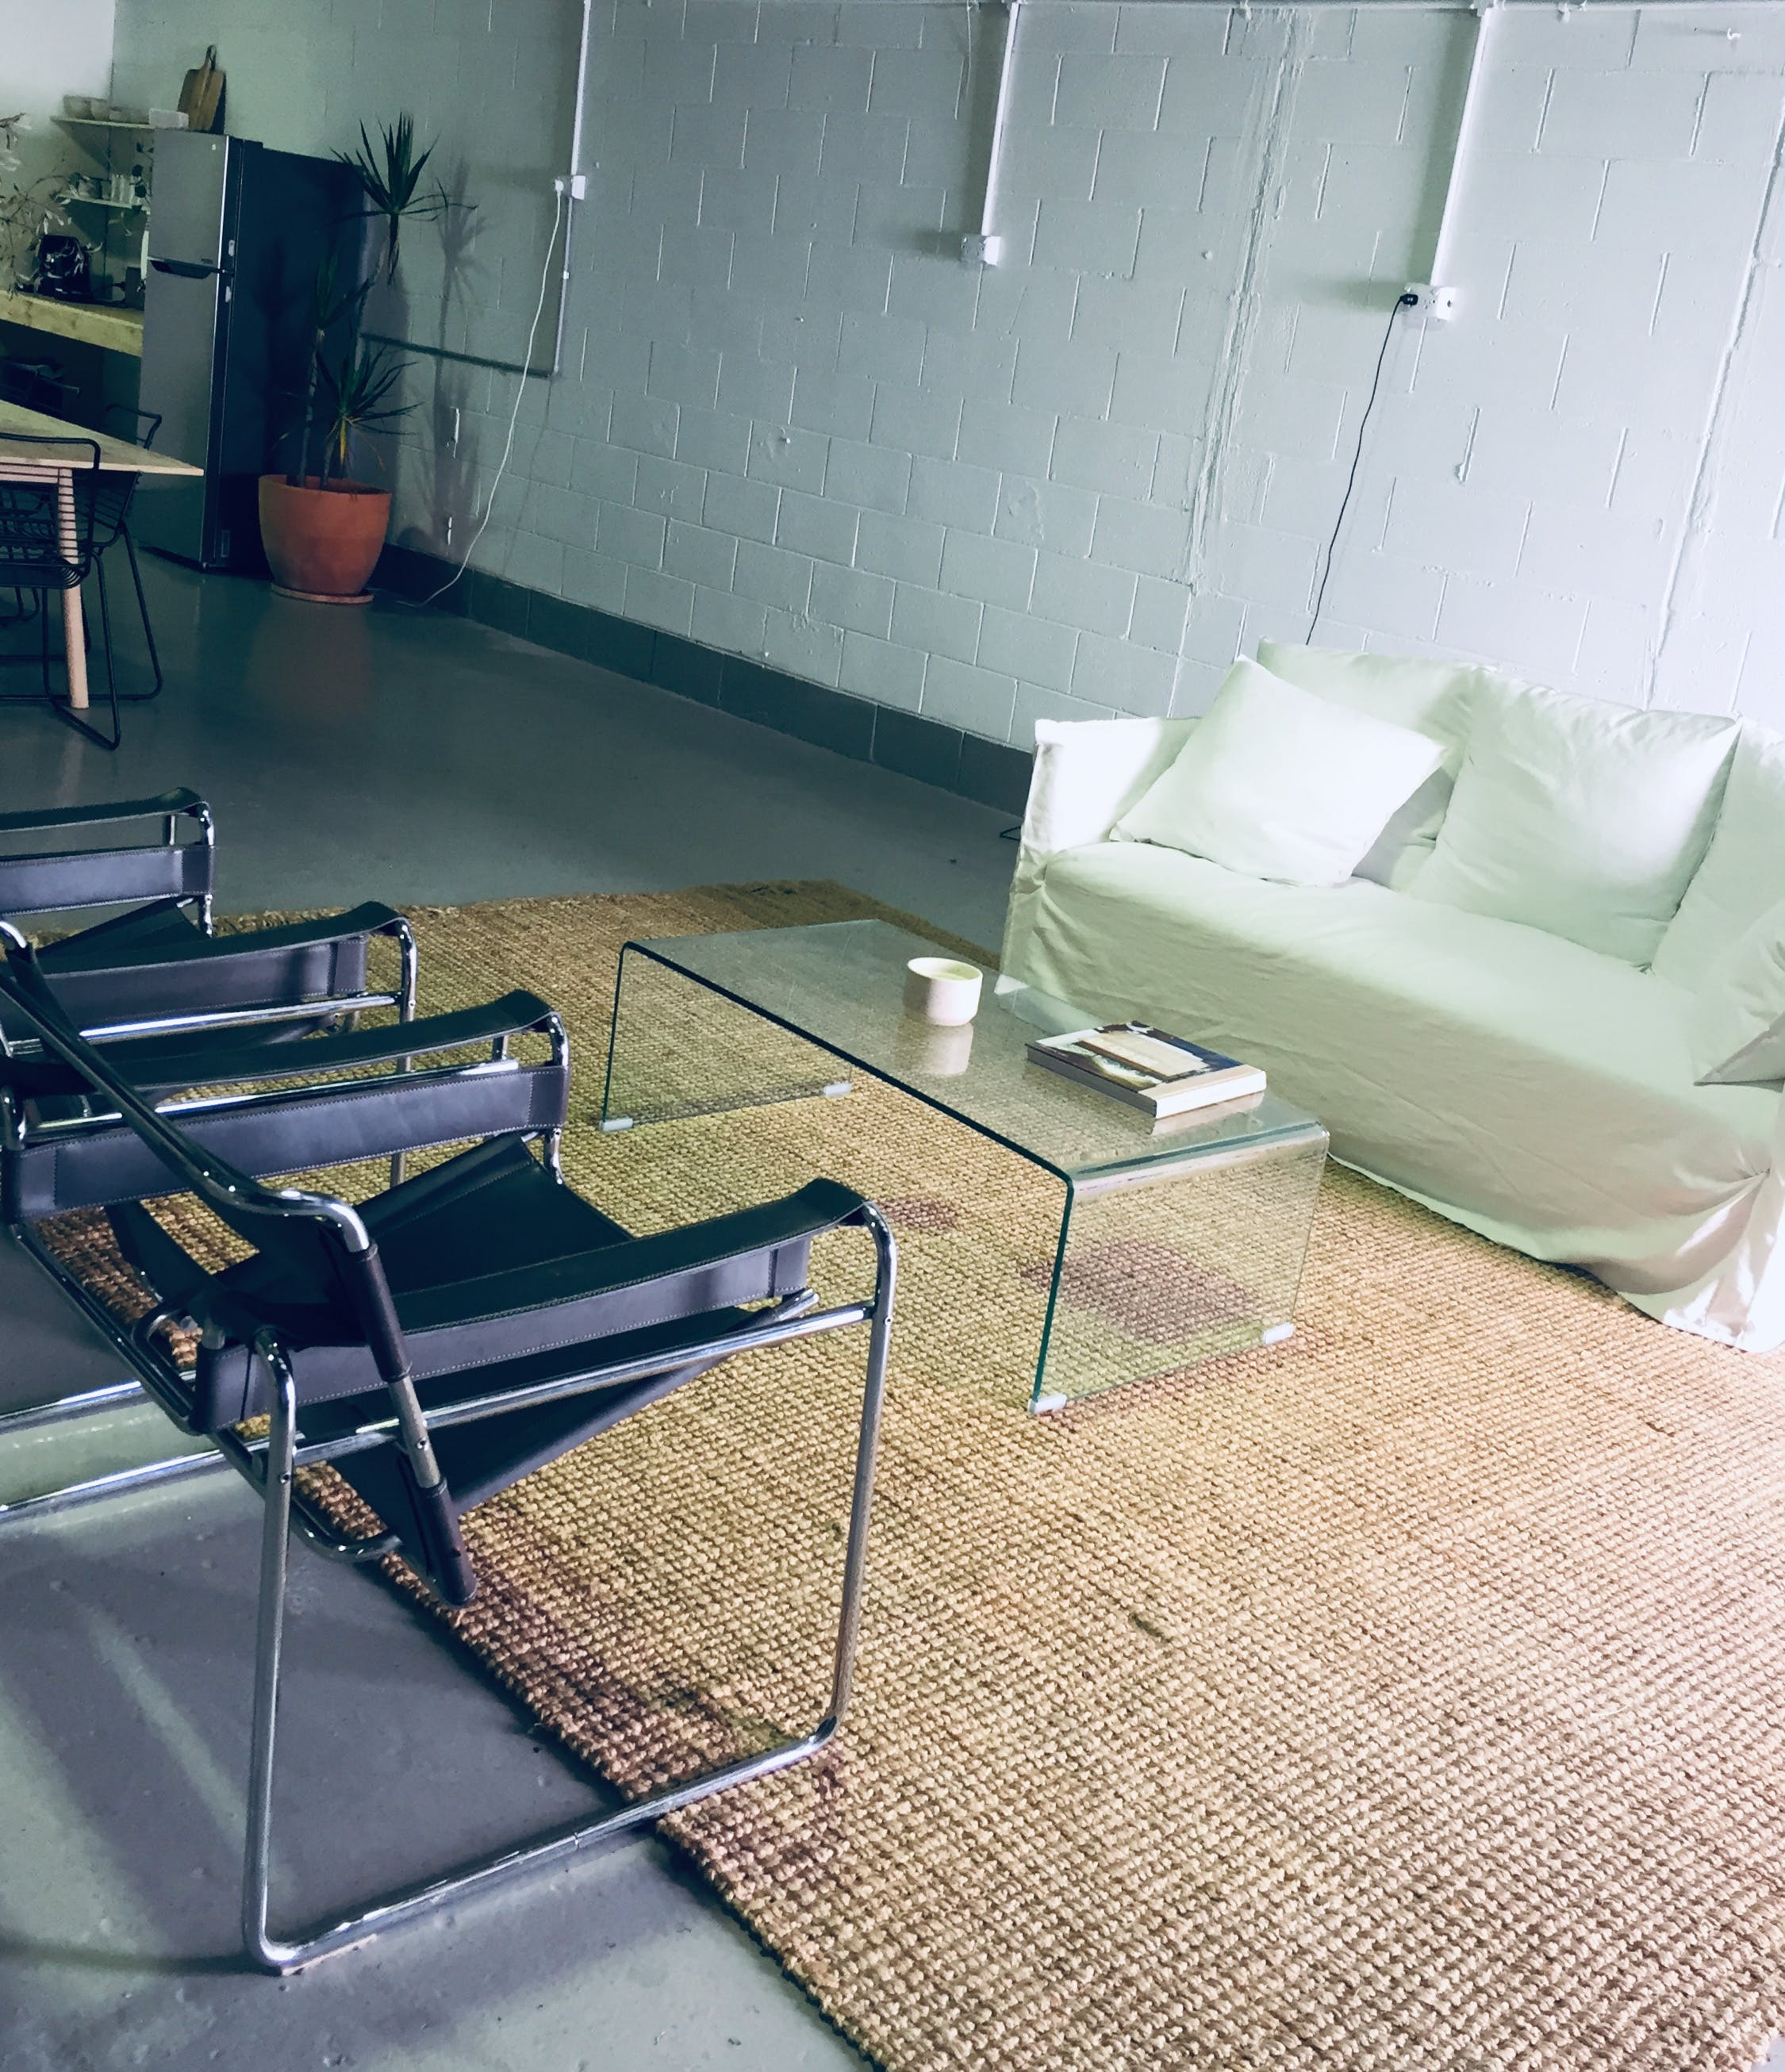 Studio Shed, creative studio at Kincumber Industrial Precinct, image 1